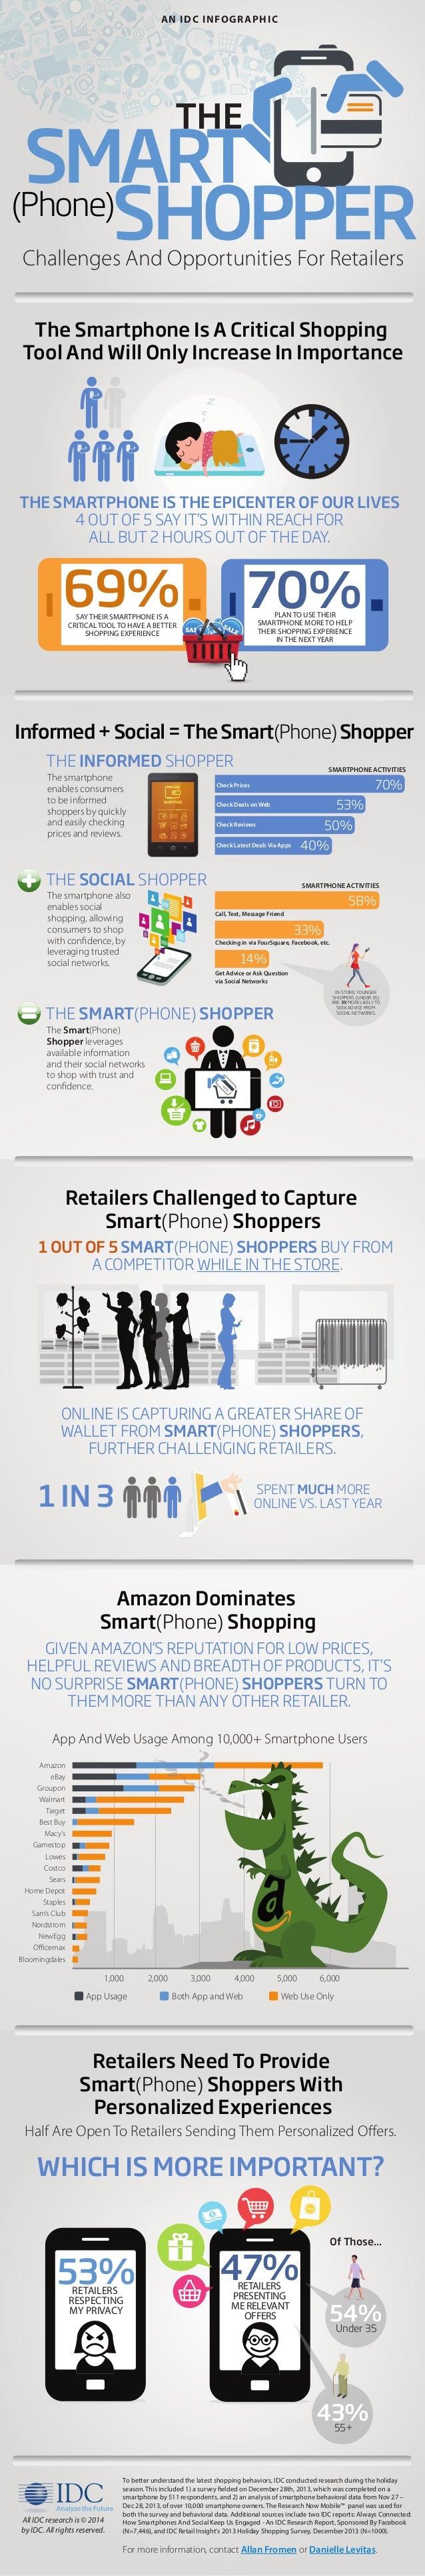 App And Web Usage Among 10,000+ Smartphone Users 1,000 2,000 3,000 4,000 5,000 6,000 Amazon eBay Groupon Walmart Target Be...